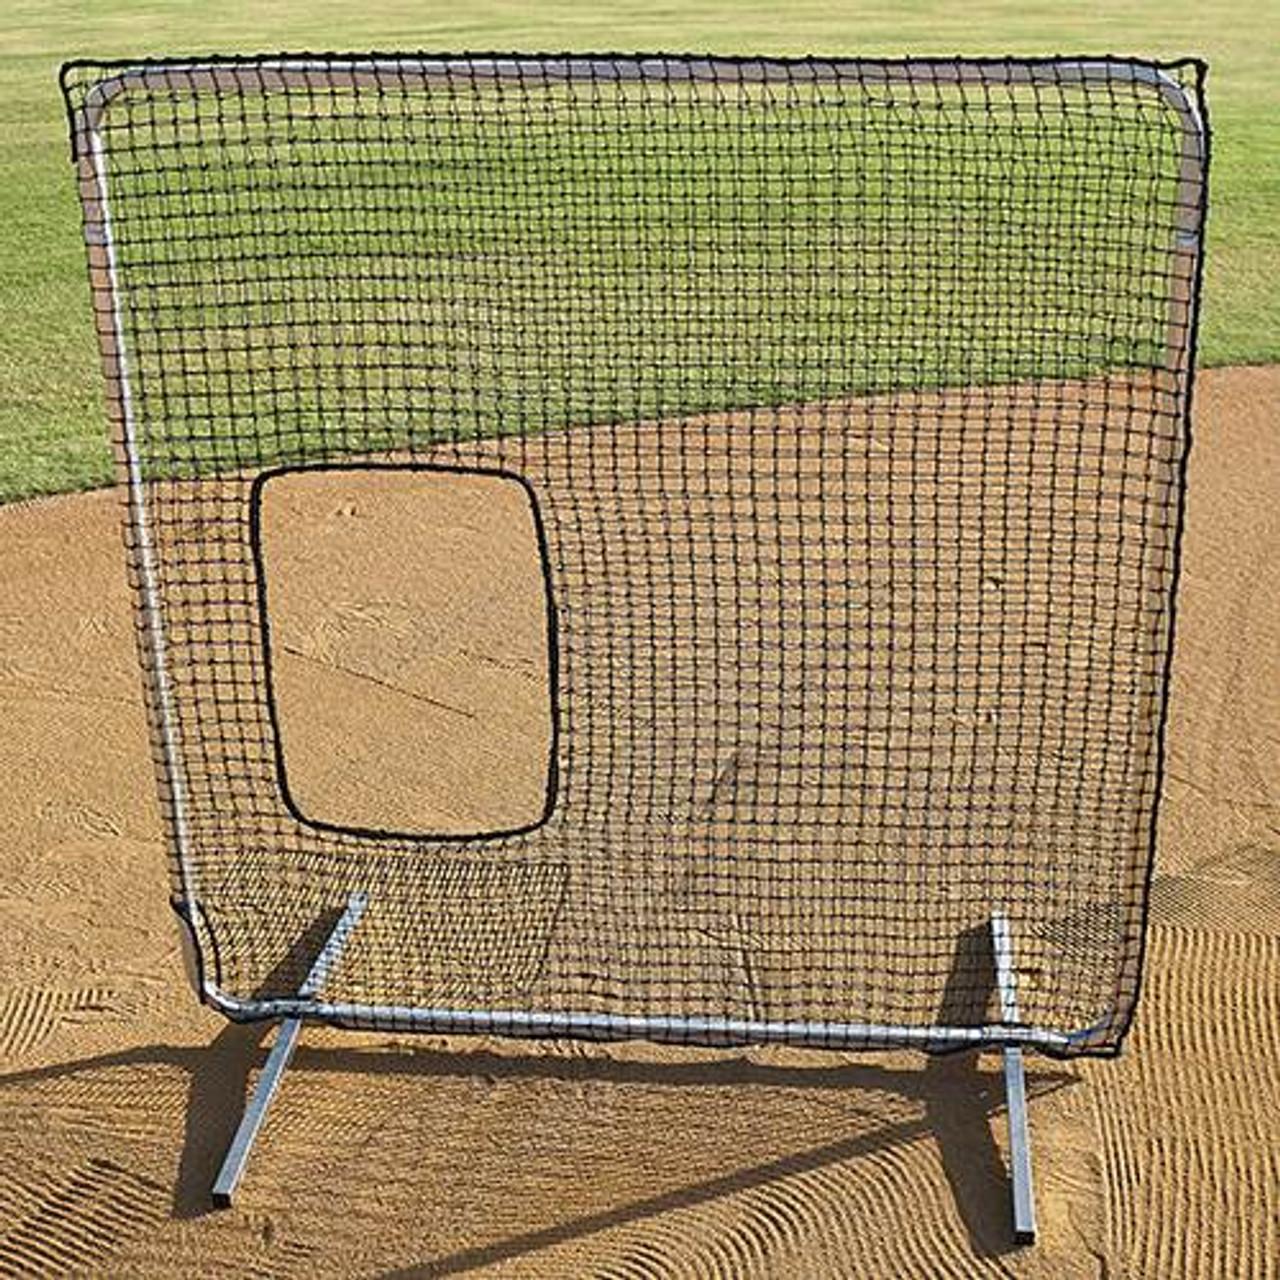 Collegiate Softball Pitchers Protector